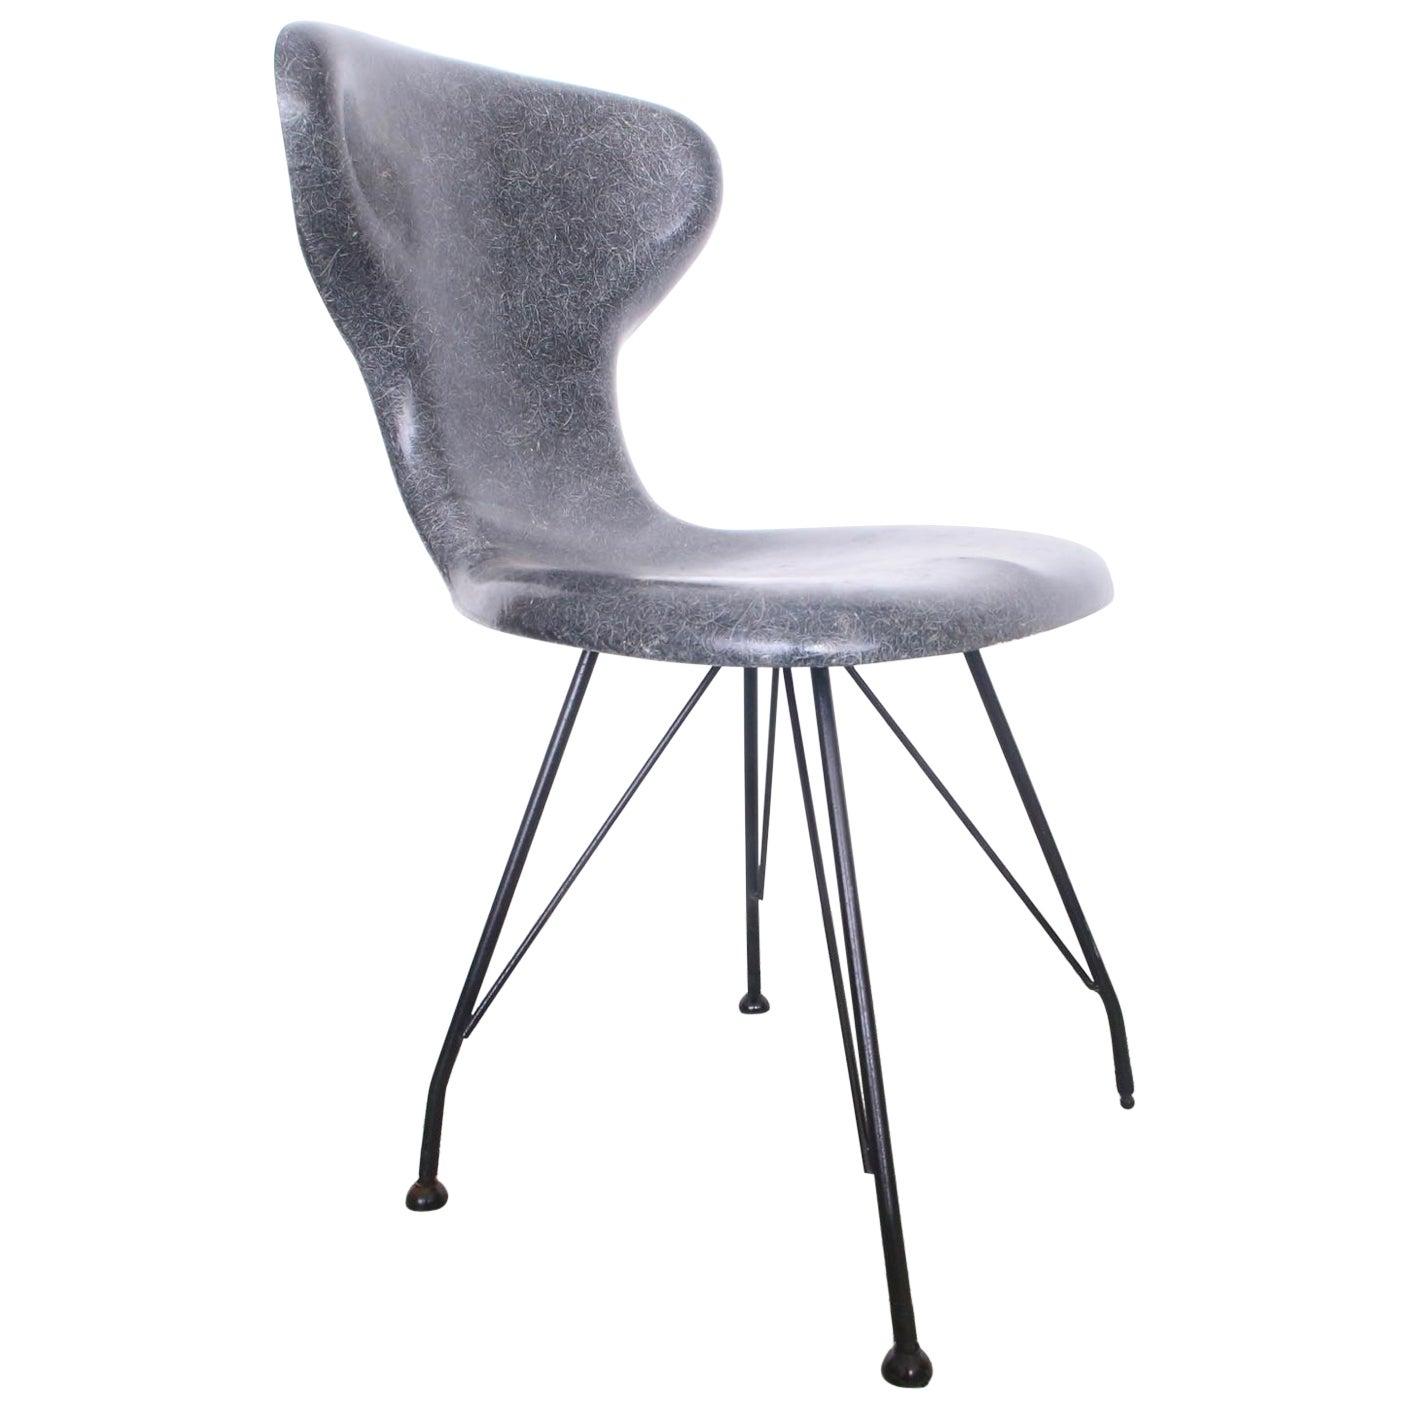 Rare Egmont Arens Fiberglass Chair